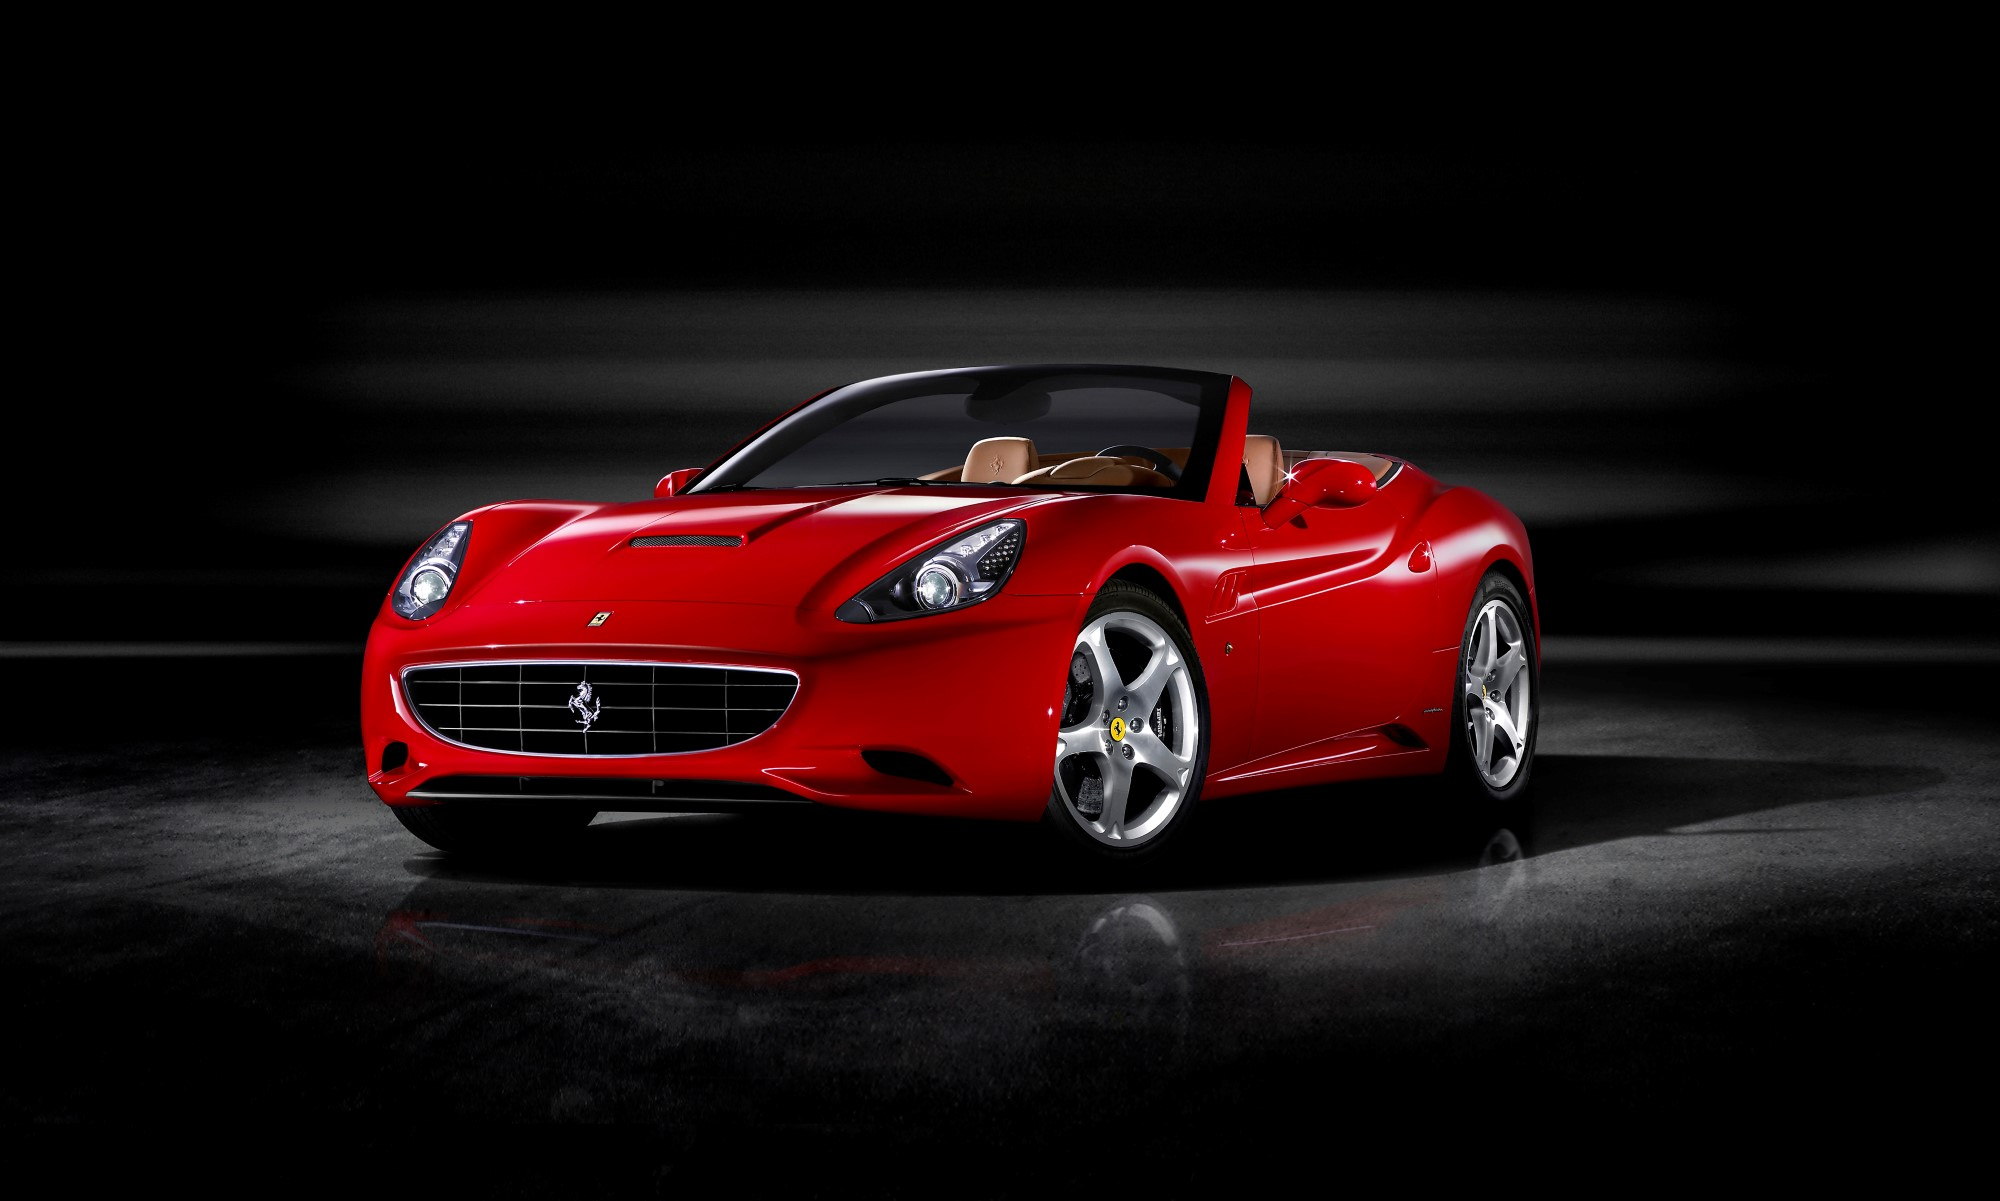 2014 Ferrari California Review, Ratings, Specs, Prices ...